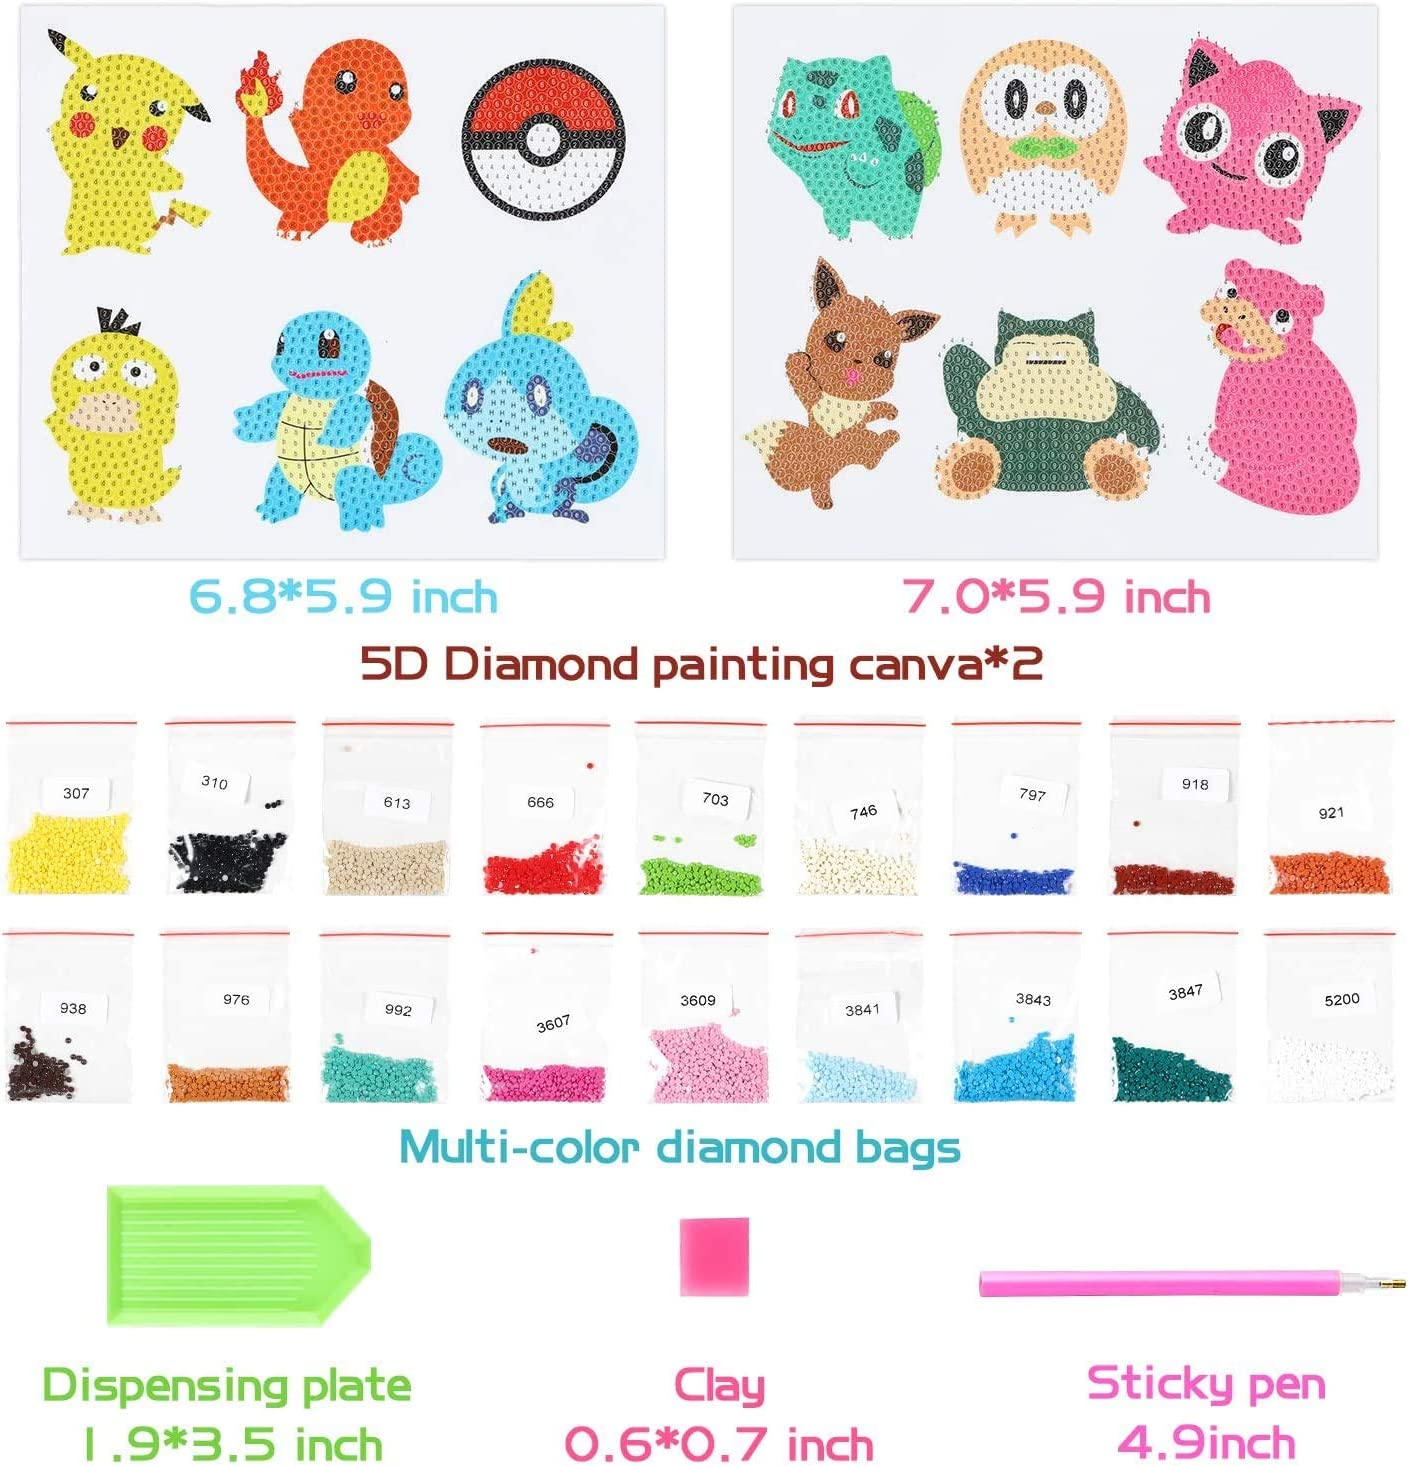 YINEW Diamond Painting-DIY 5D Diamond Painting Kits for Adults and Beginners 12 Pcs Pikachu Diamond Art Mosaic Stickers by Numbers Kits